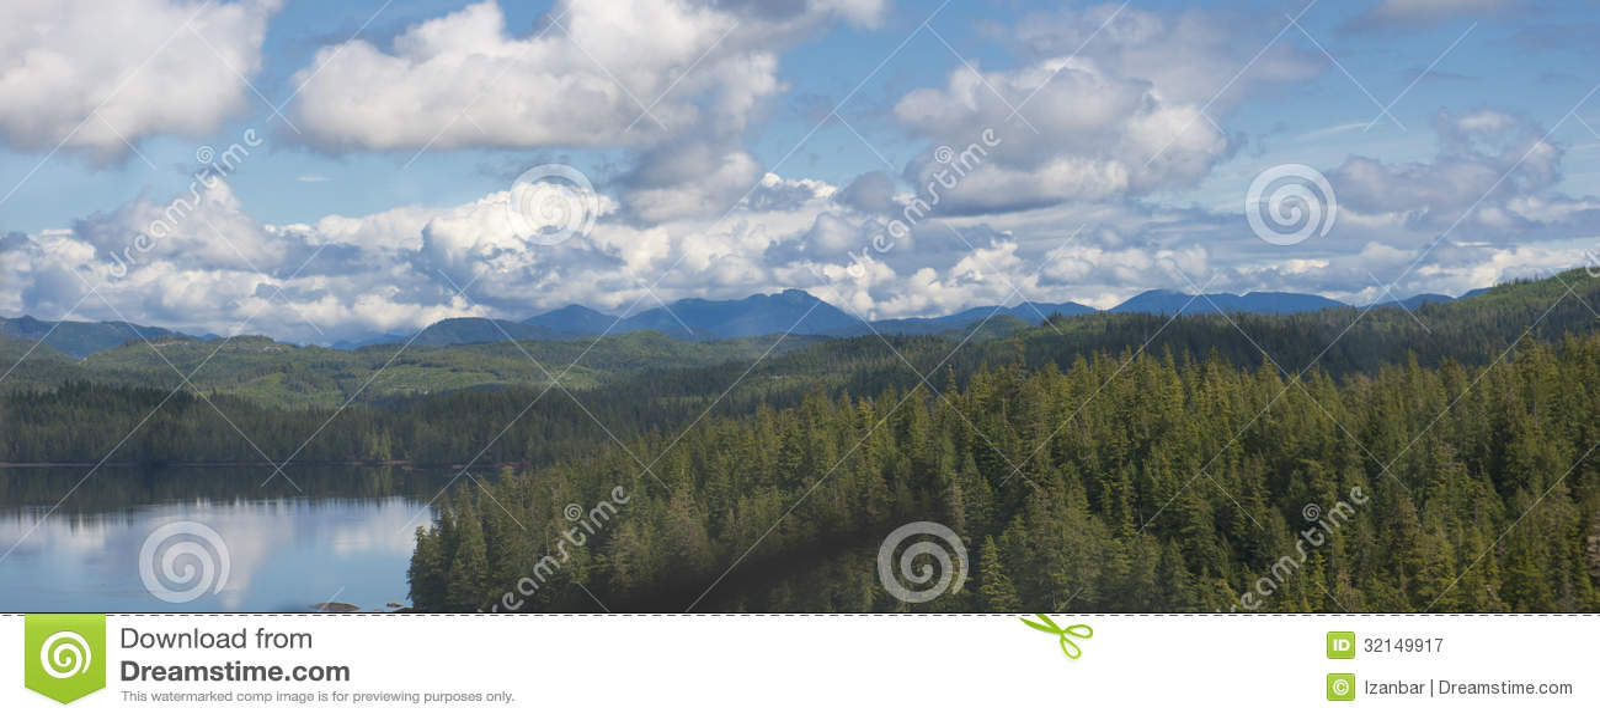 Alaska-Prinz der Wales-Inselvogelperspektive